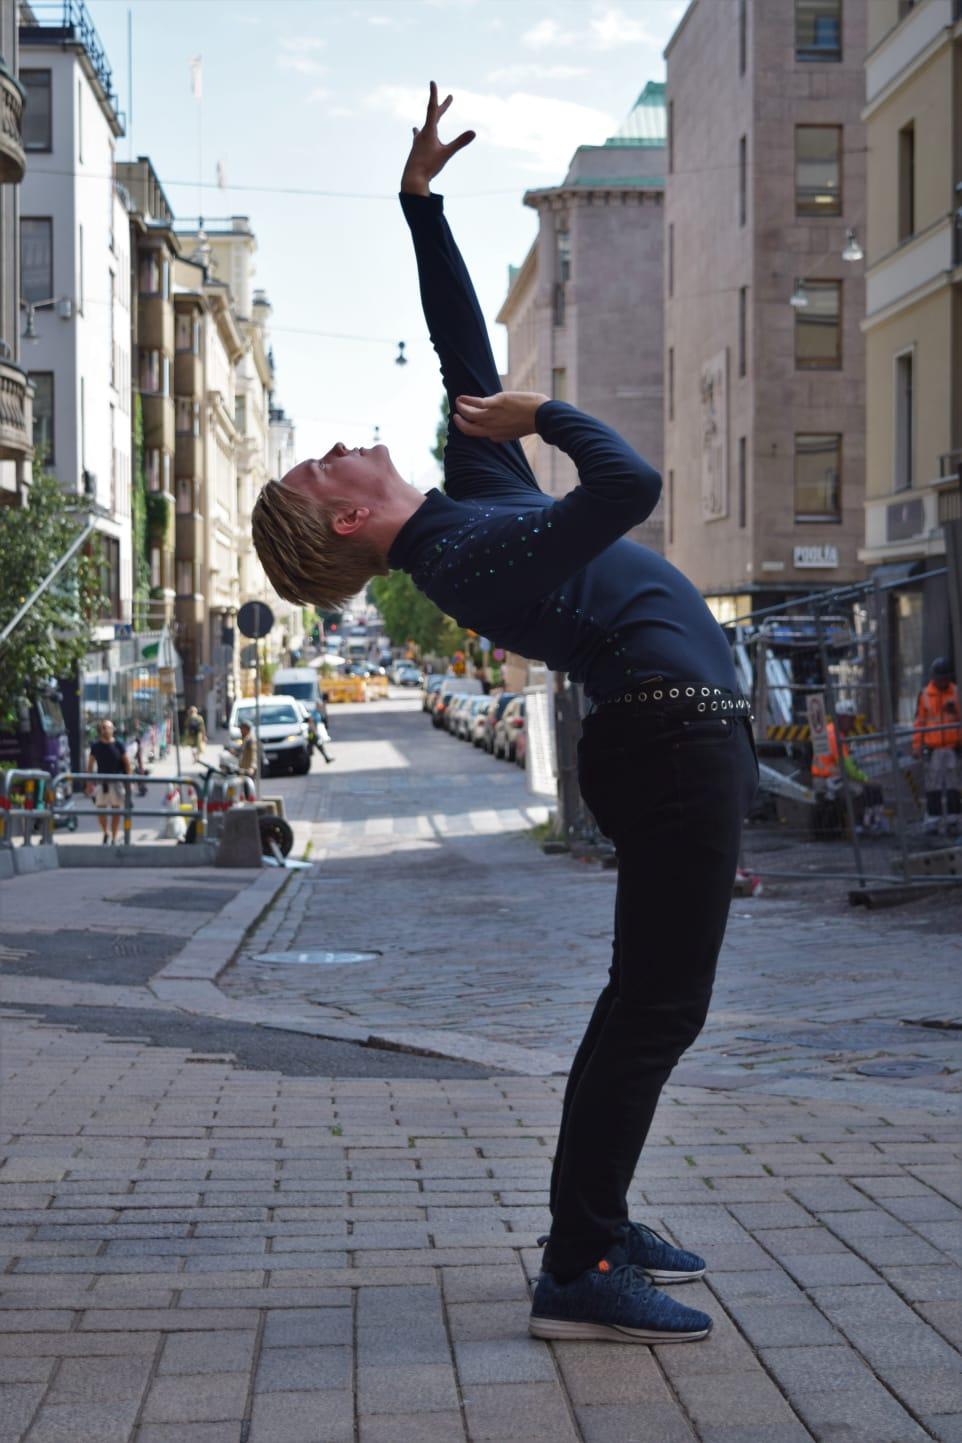 Mies tanssii kadulla.